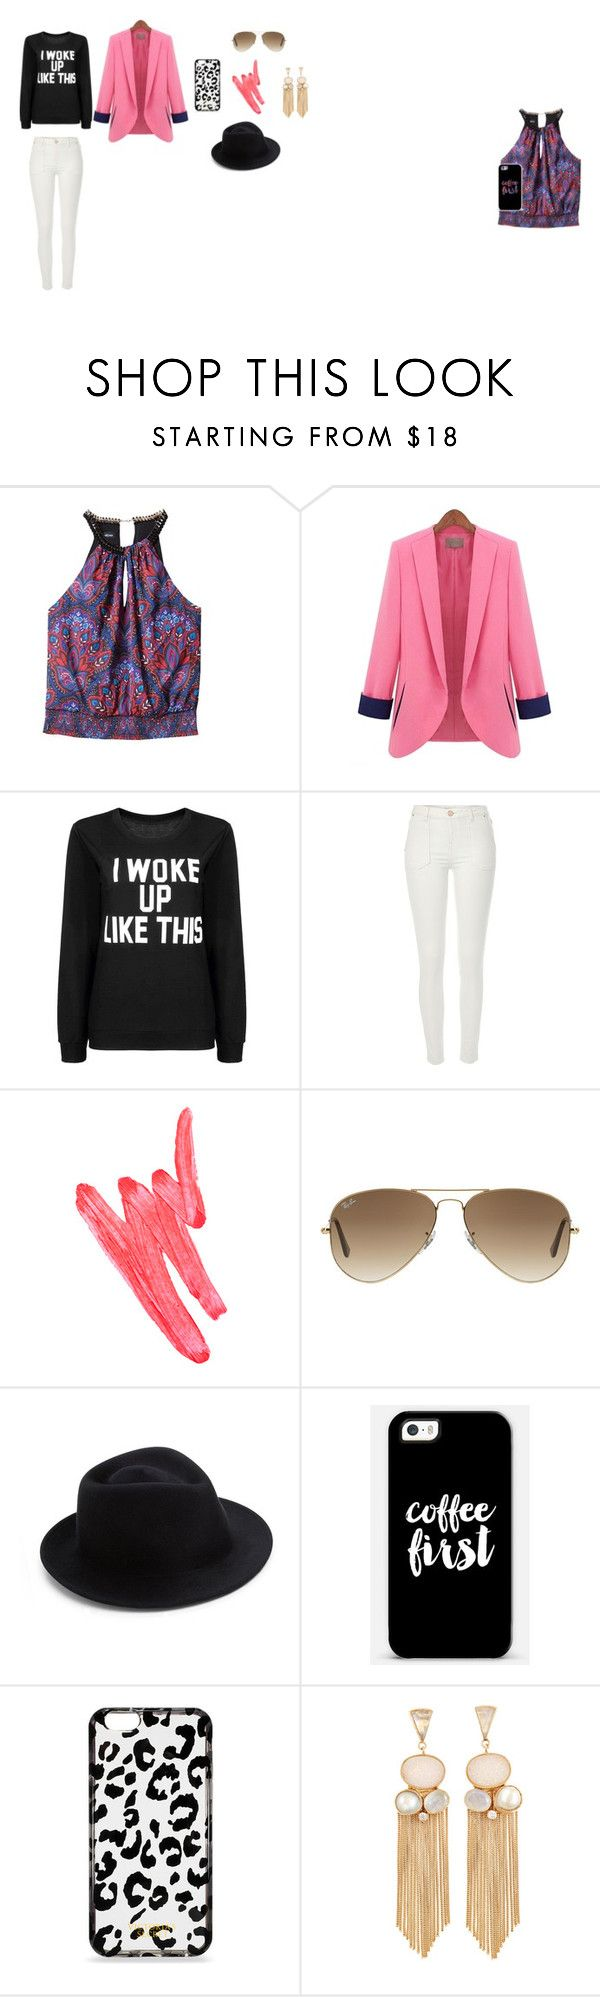 """pink i woke up"" by nattavr on Polyvore featuring moda, Bebe, River Island, Ilia, Ray-Ban, Eugenia Kim, Casetify y Victoria's Secret"